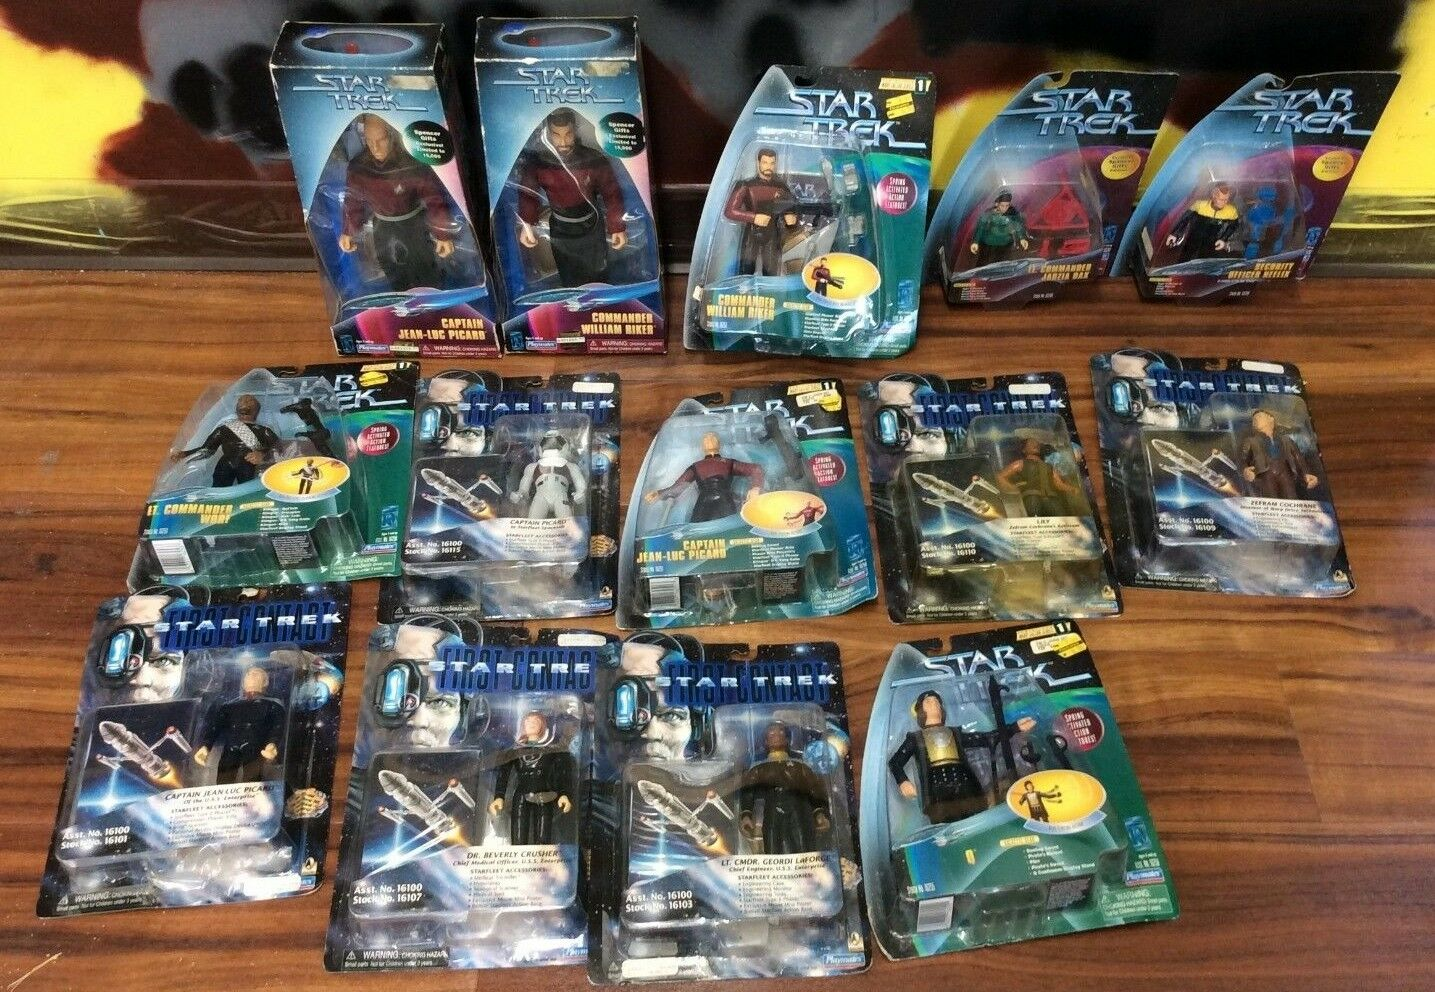 Playmates Star Trek Action Figure Lot Of 14  New In Box  Shelf Wear  See Pics